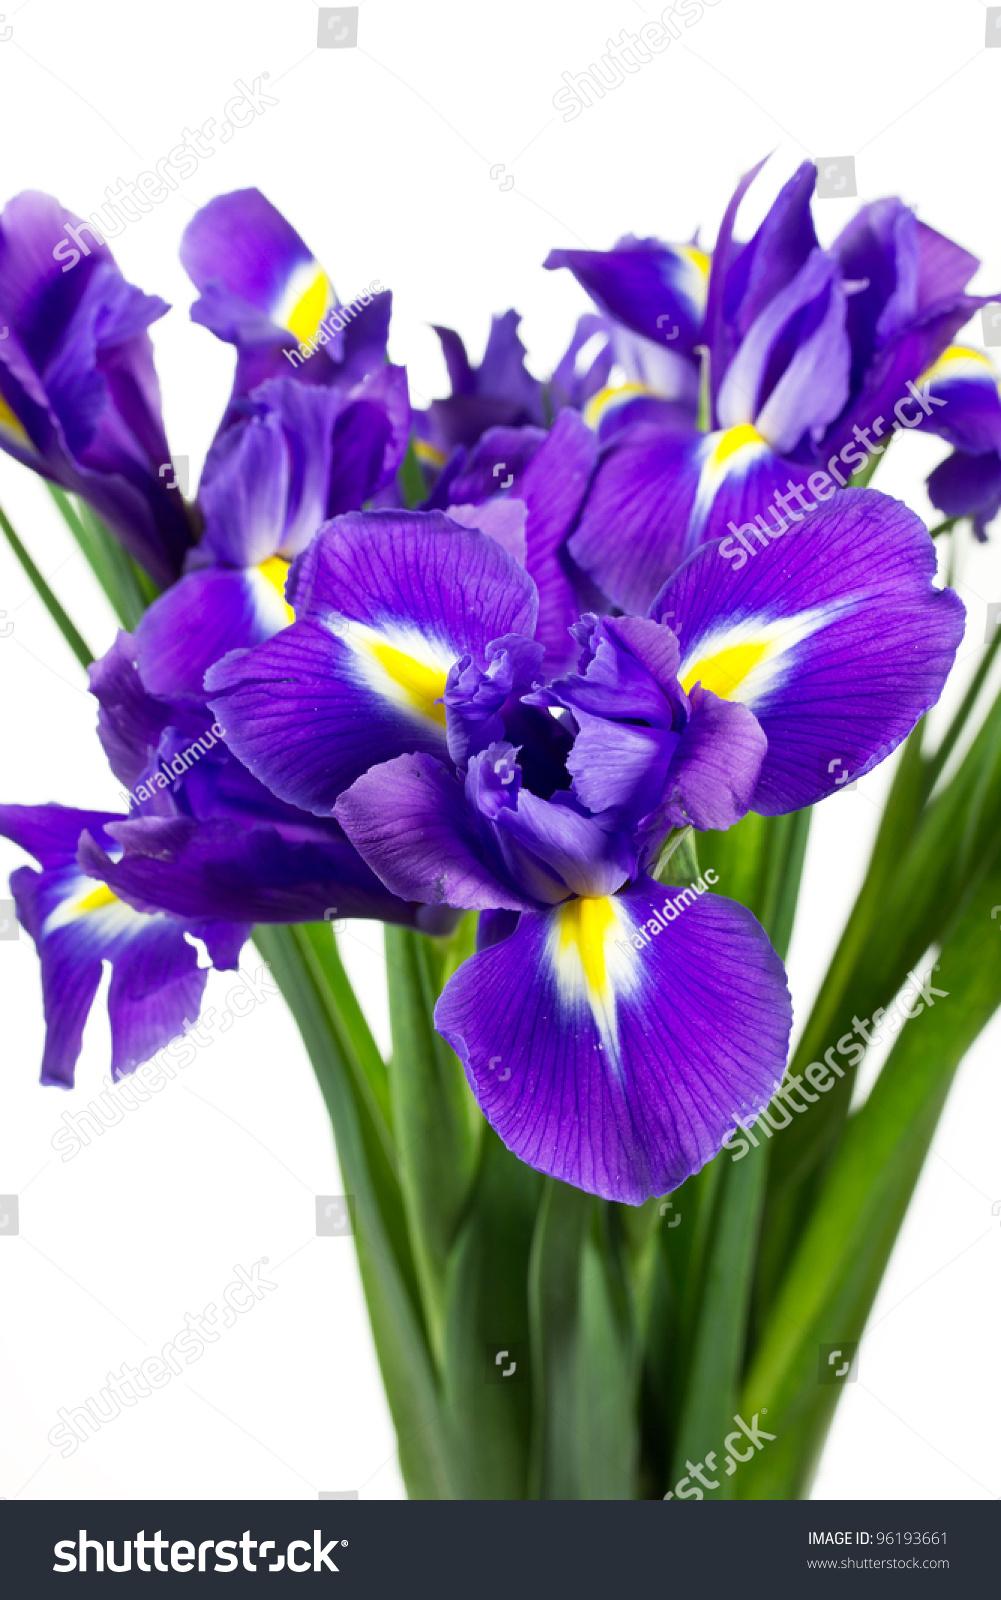 Dark purple iris flowers isolated on white background ez canvas id 96193661 izmirmasajfo